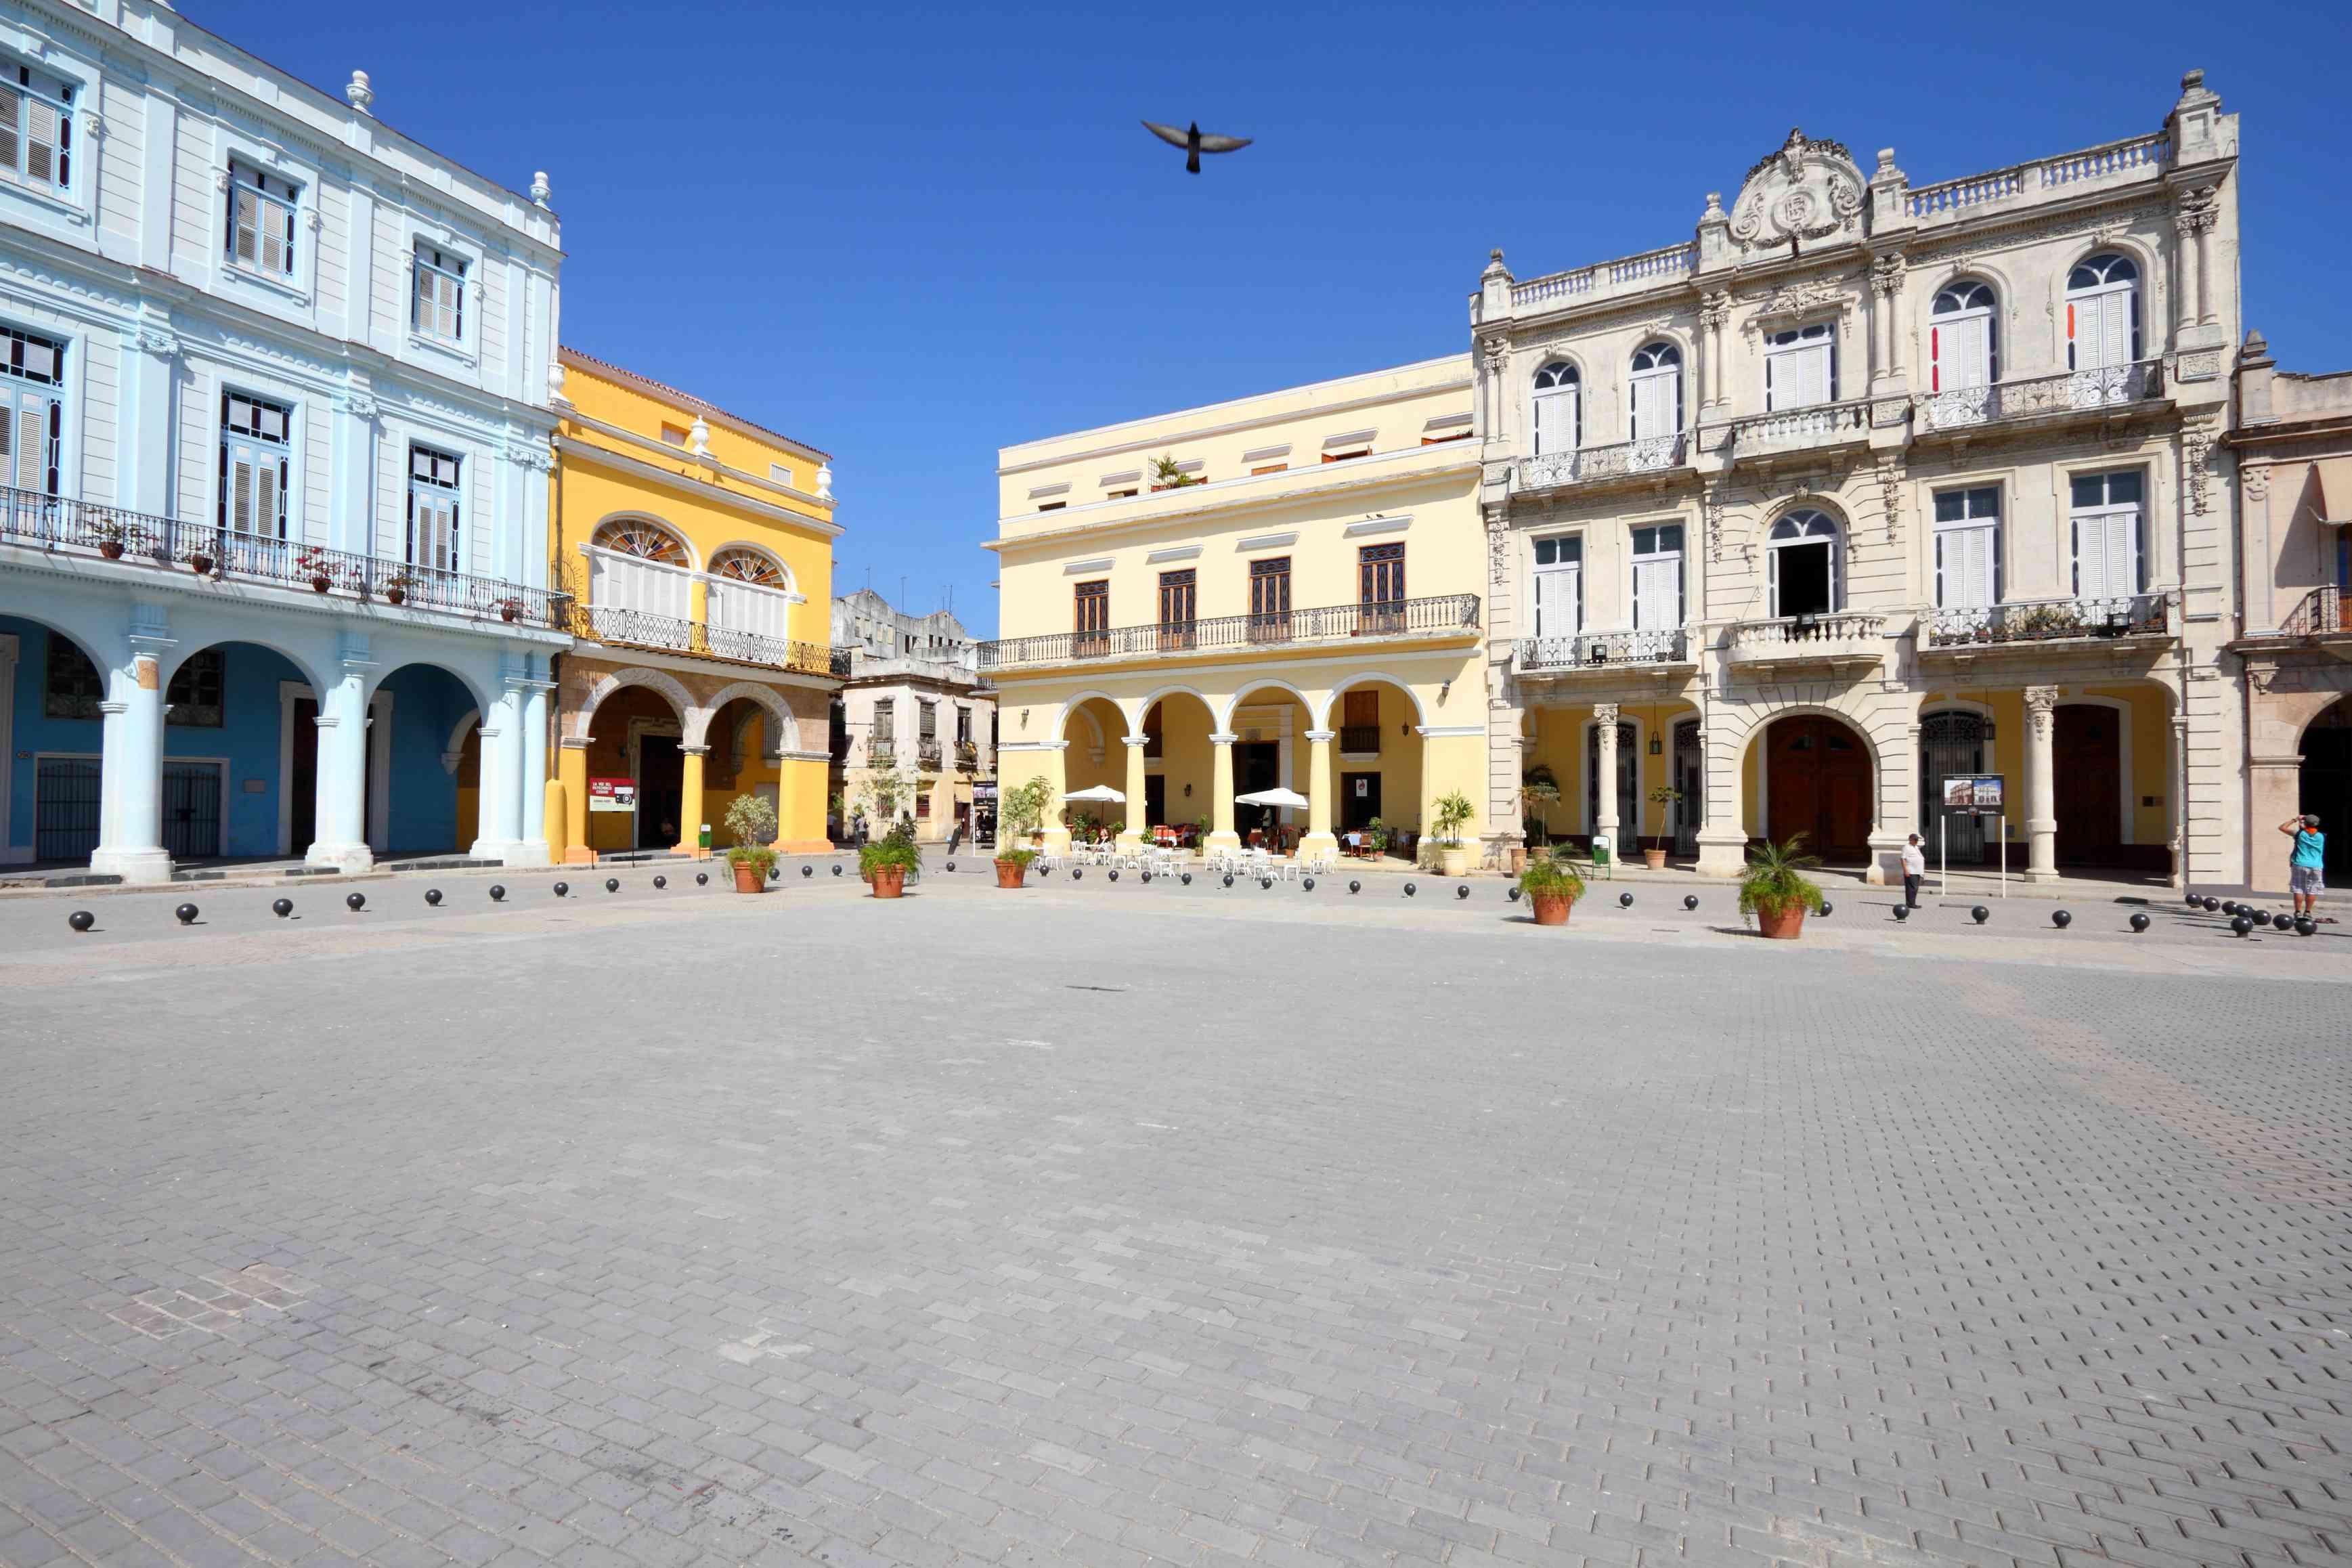 Plaza Vieja square